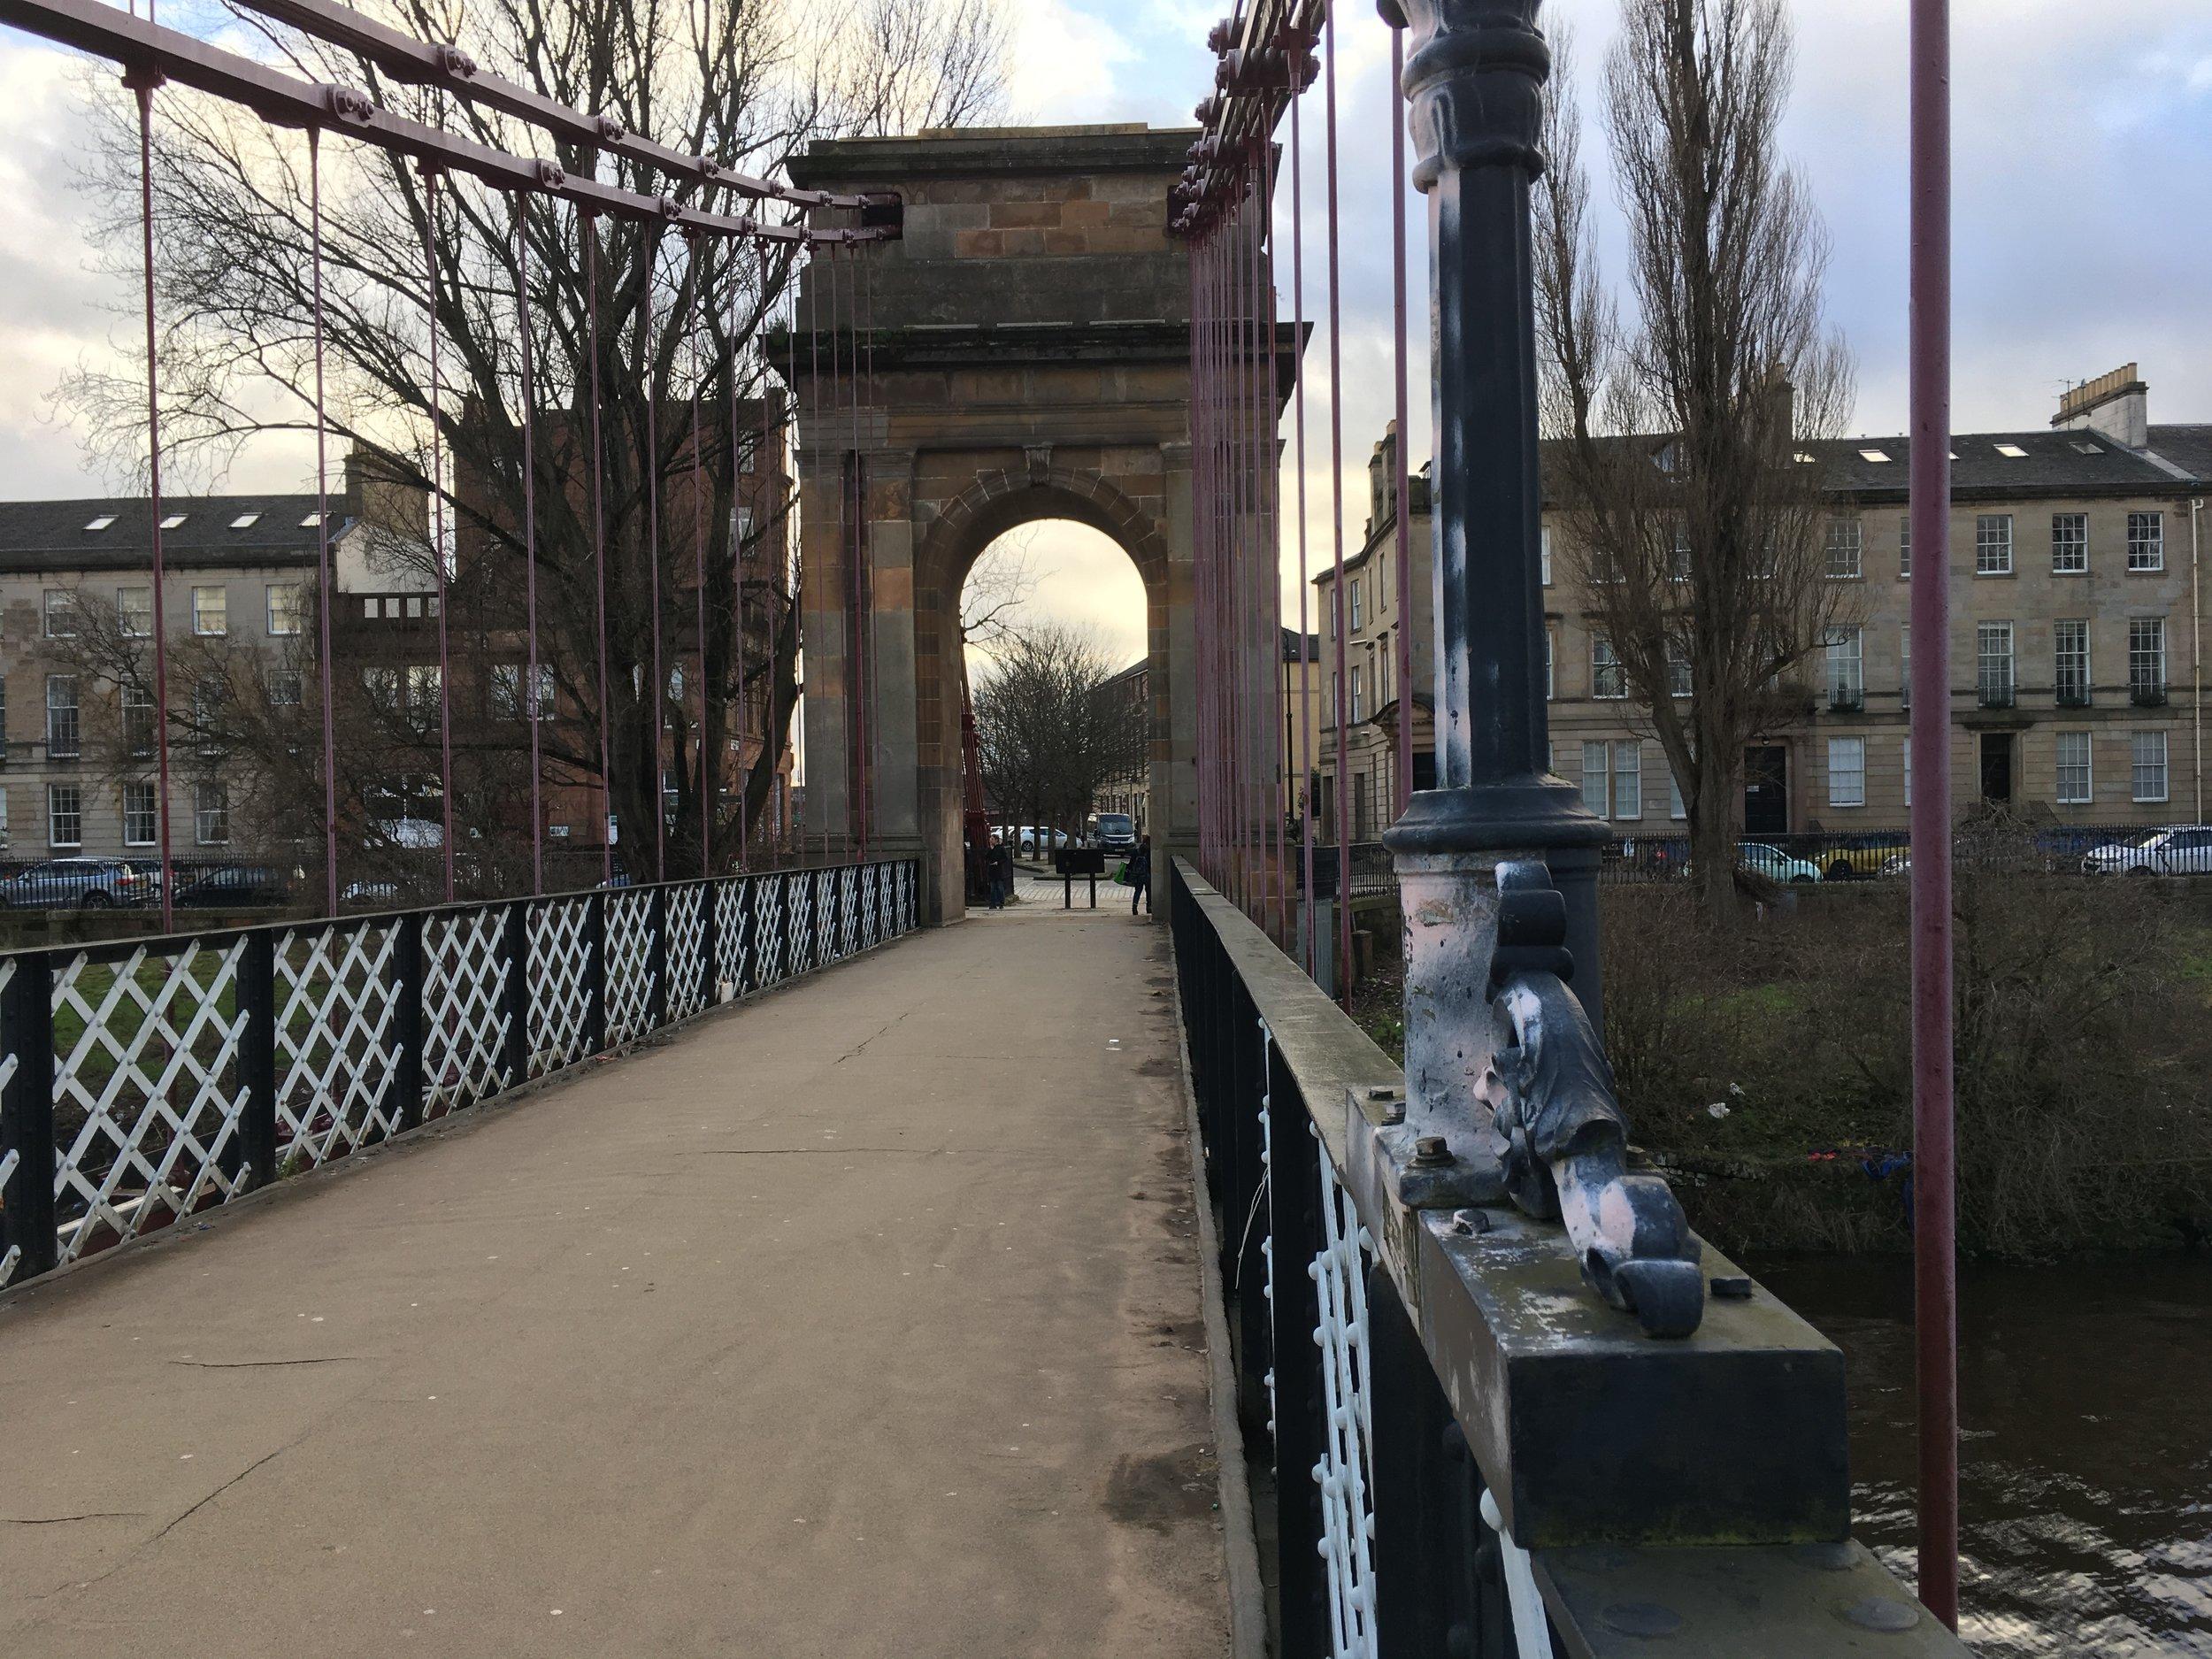 Location-scouting bridges in Glasgow